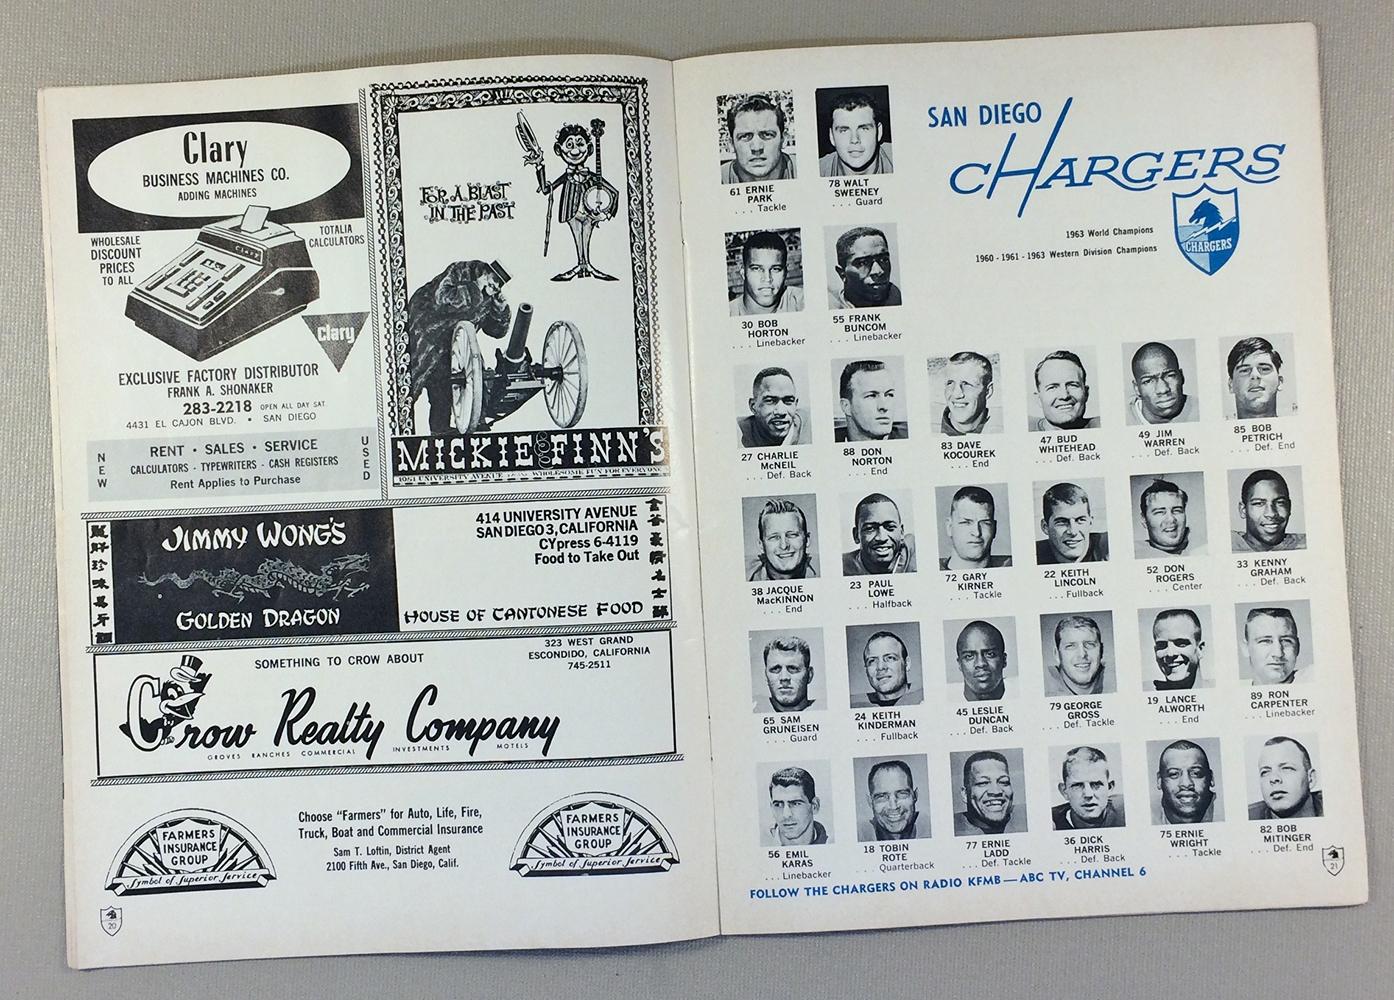 football_afl_chargers_bills_1964_C.jpg